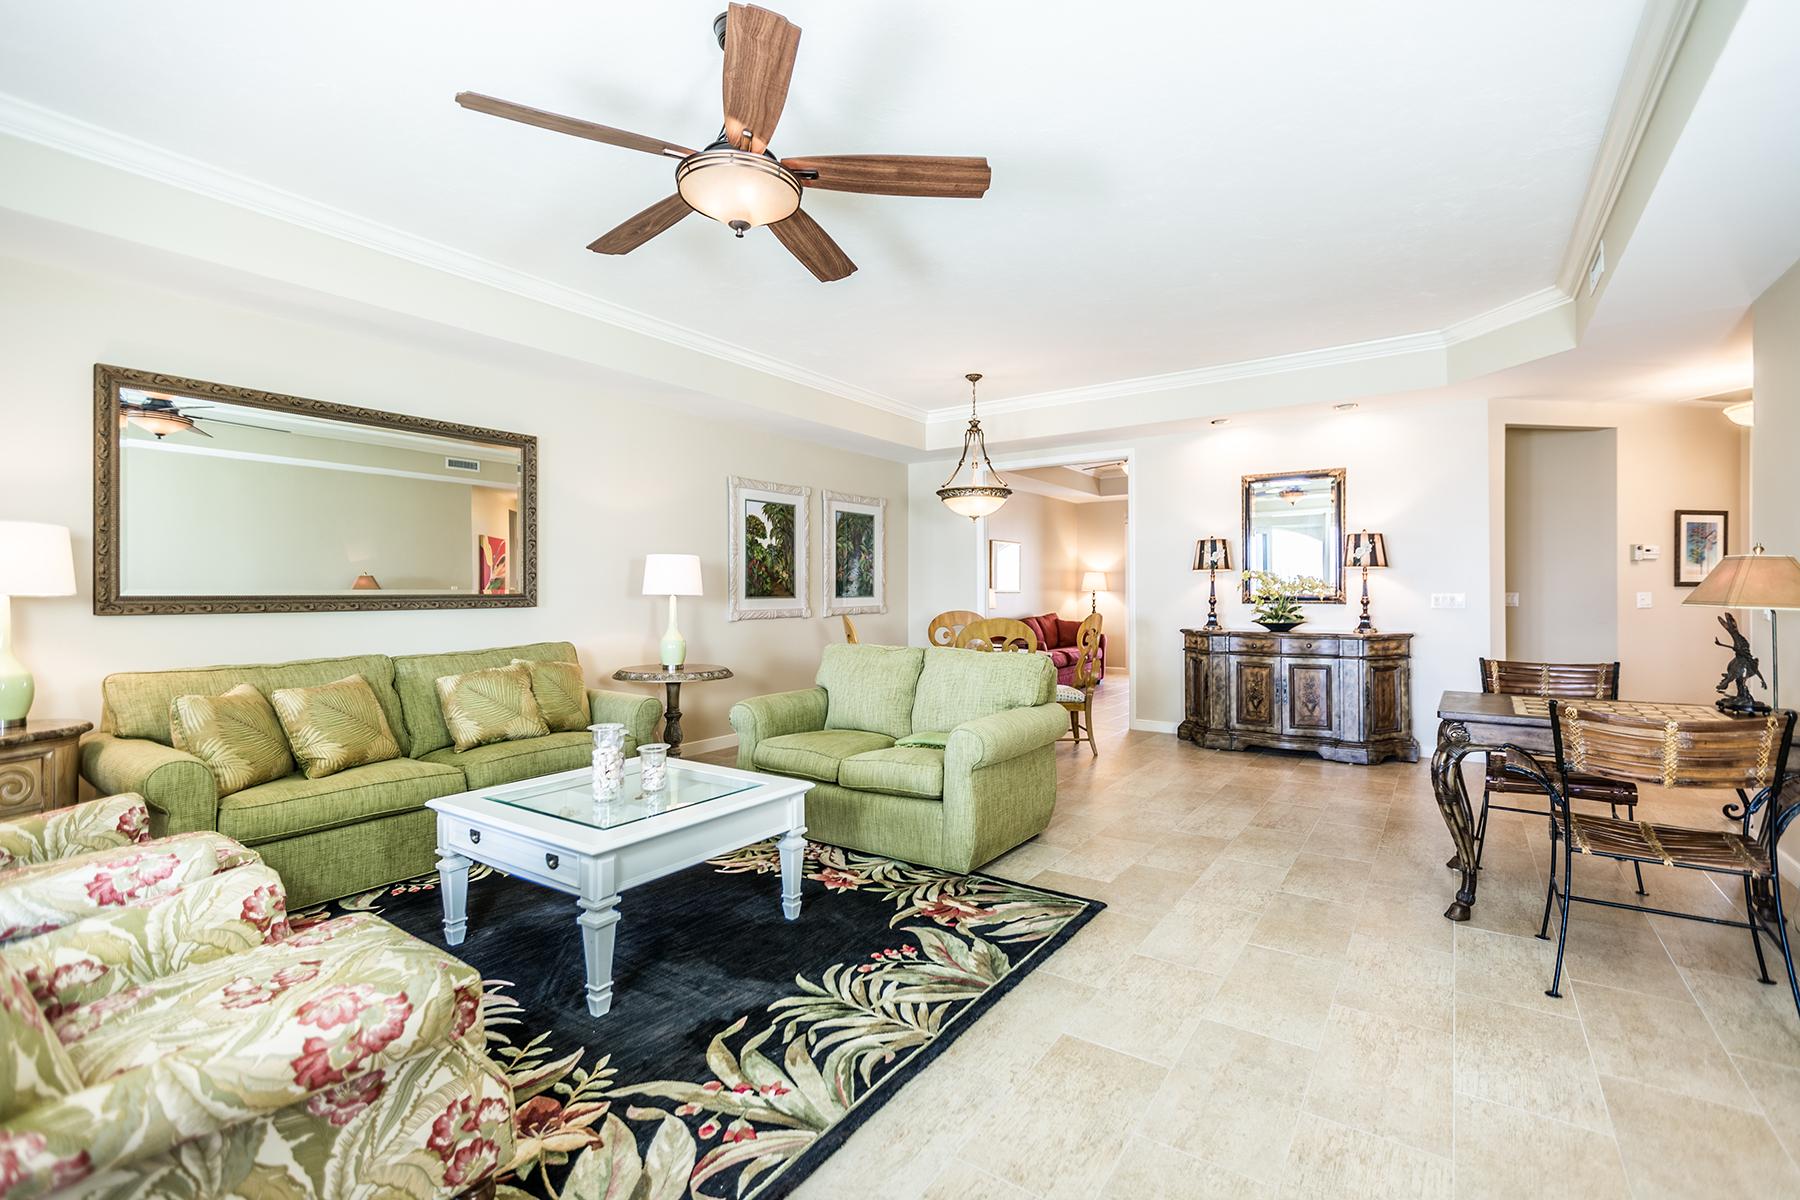 Condomínio para Venda às MARCO ISLAND 3000 Royal Marco Way 519 Marco Island, Florida, 34145 Estados Unidos